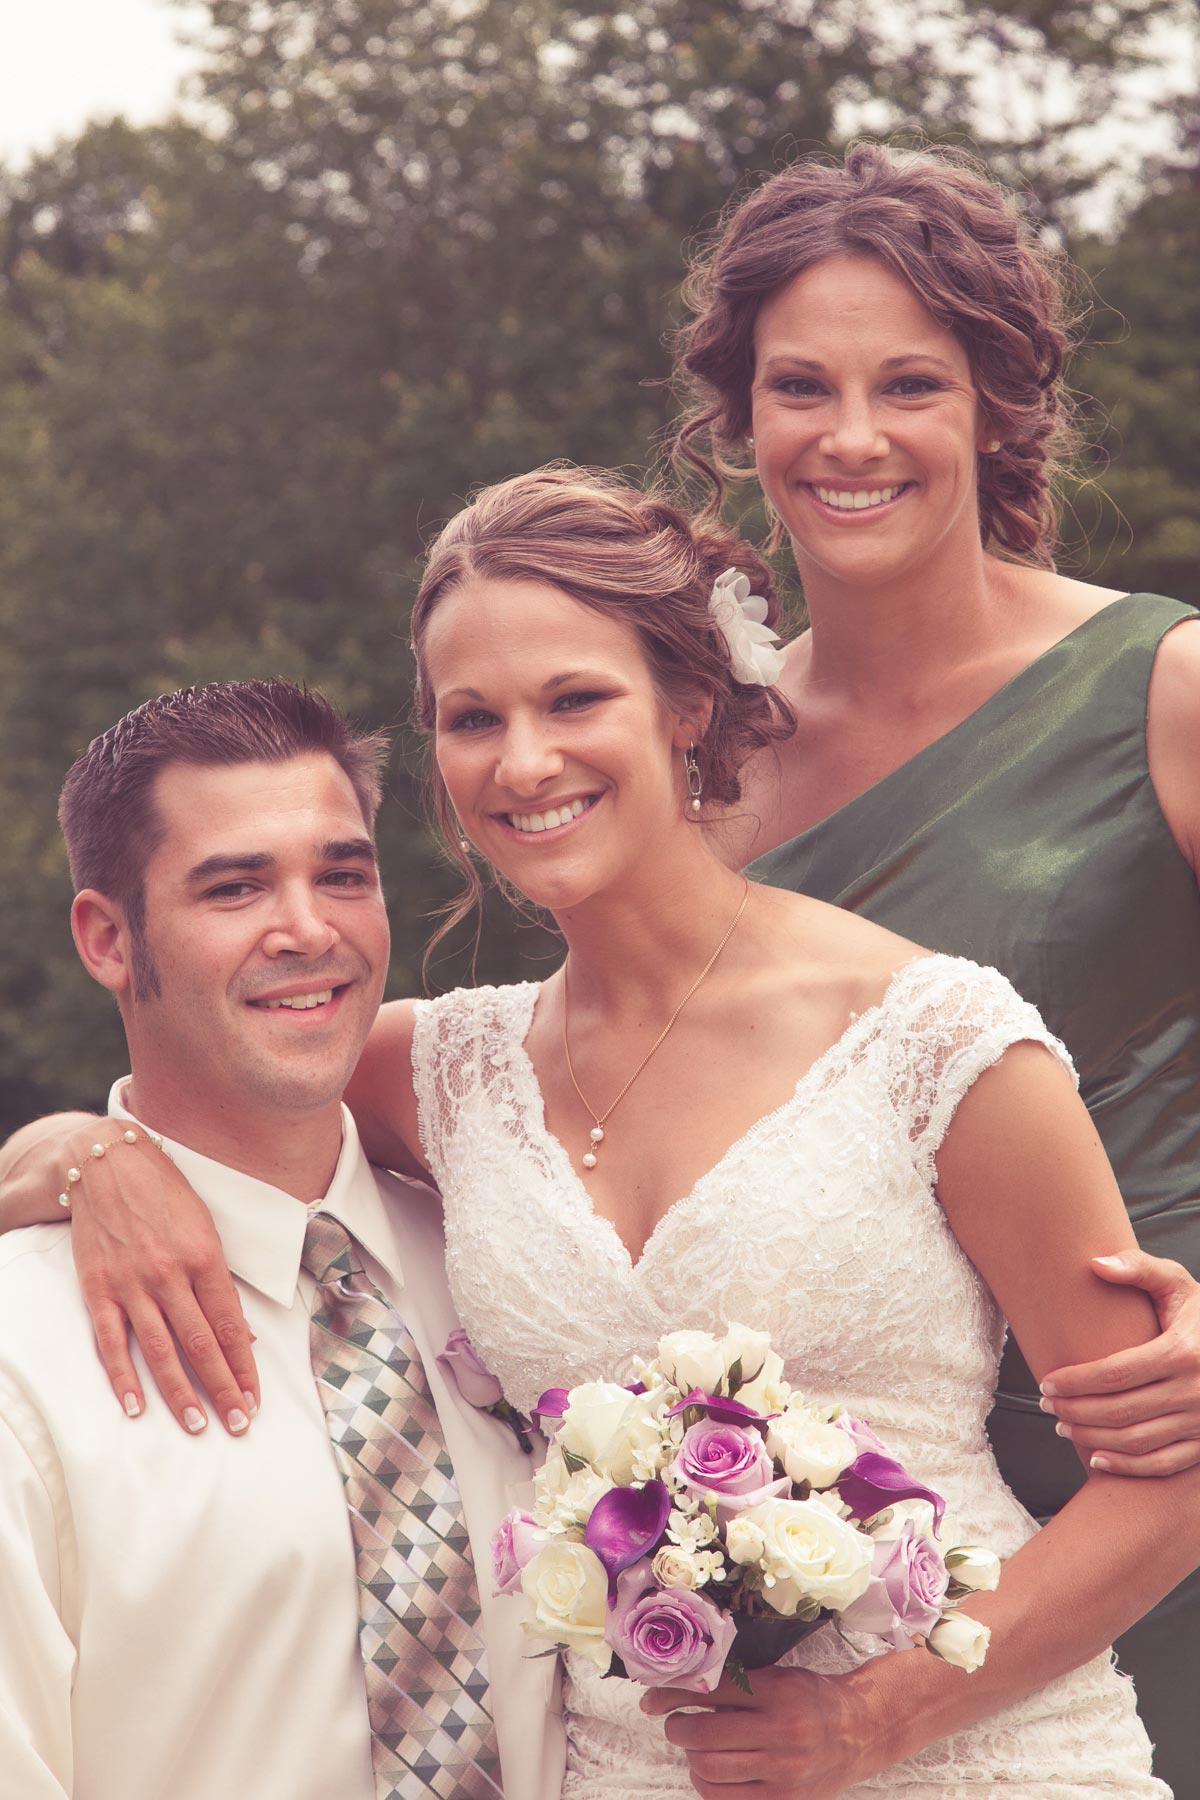 evansville-wedding-photographer-pabst-photo-kokies-echo-valley-(51)